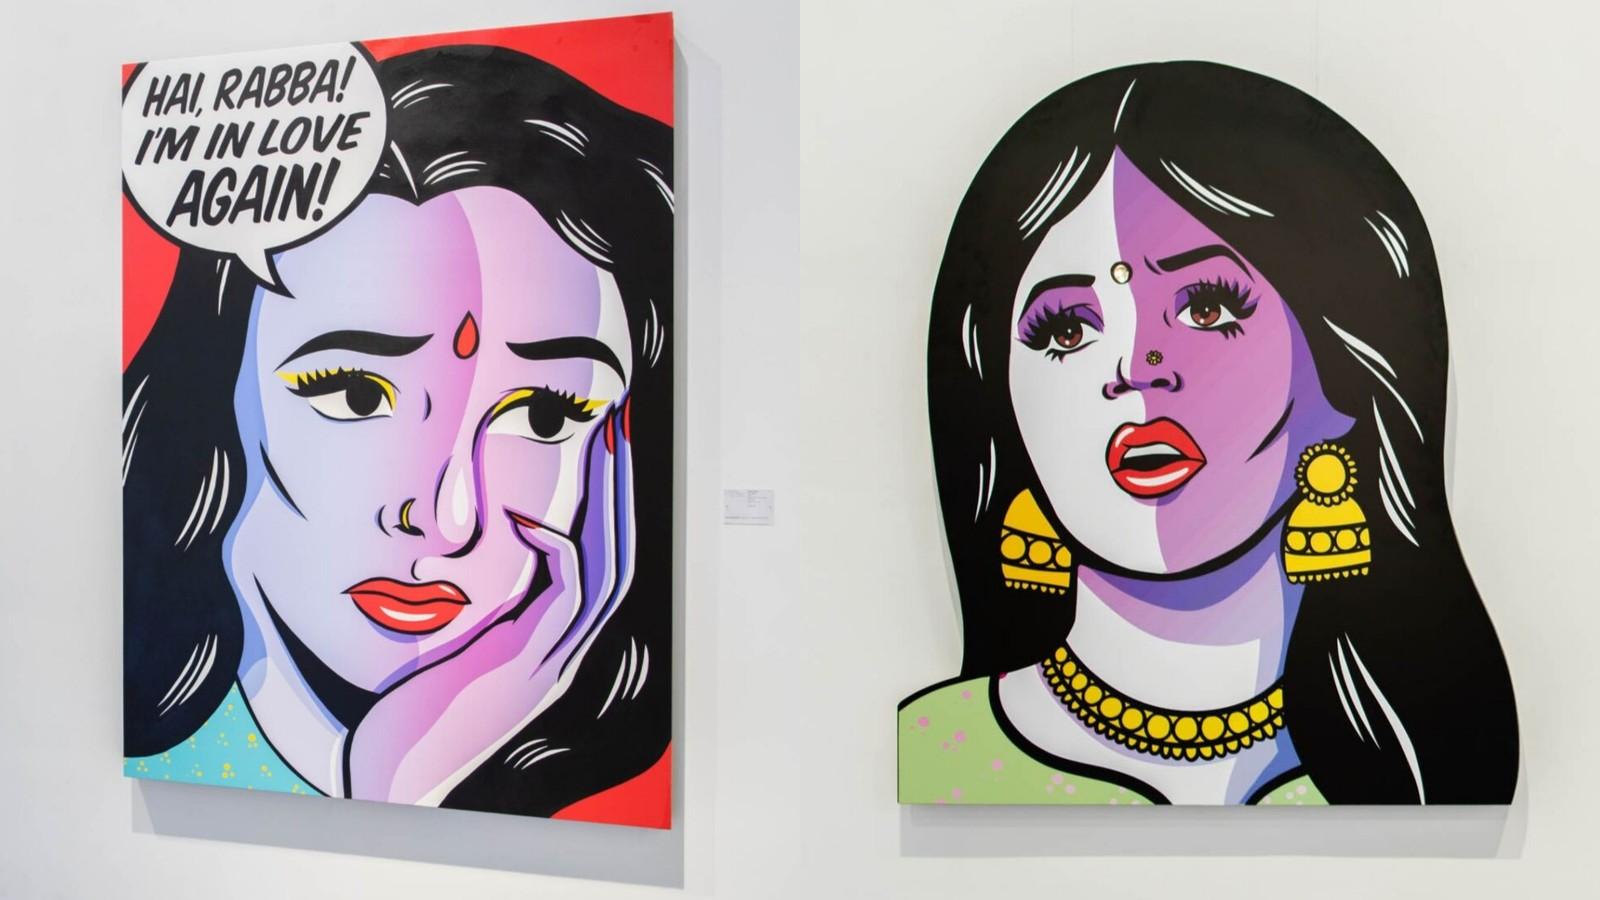 Maria Qamar Refuses to Keep Her Art a Secret Anymore